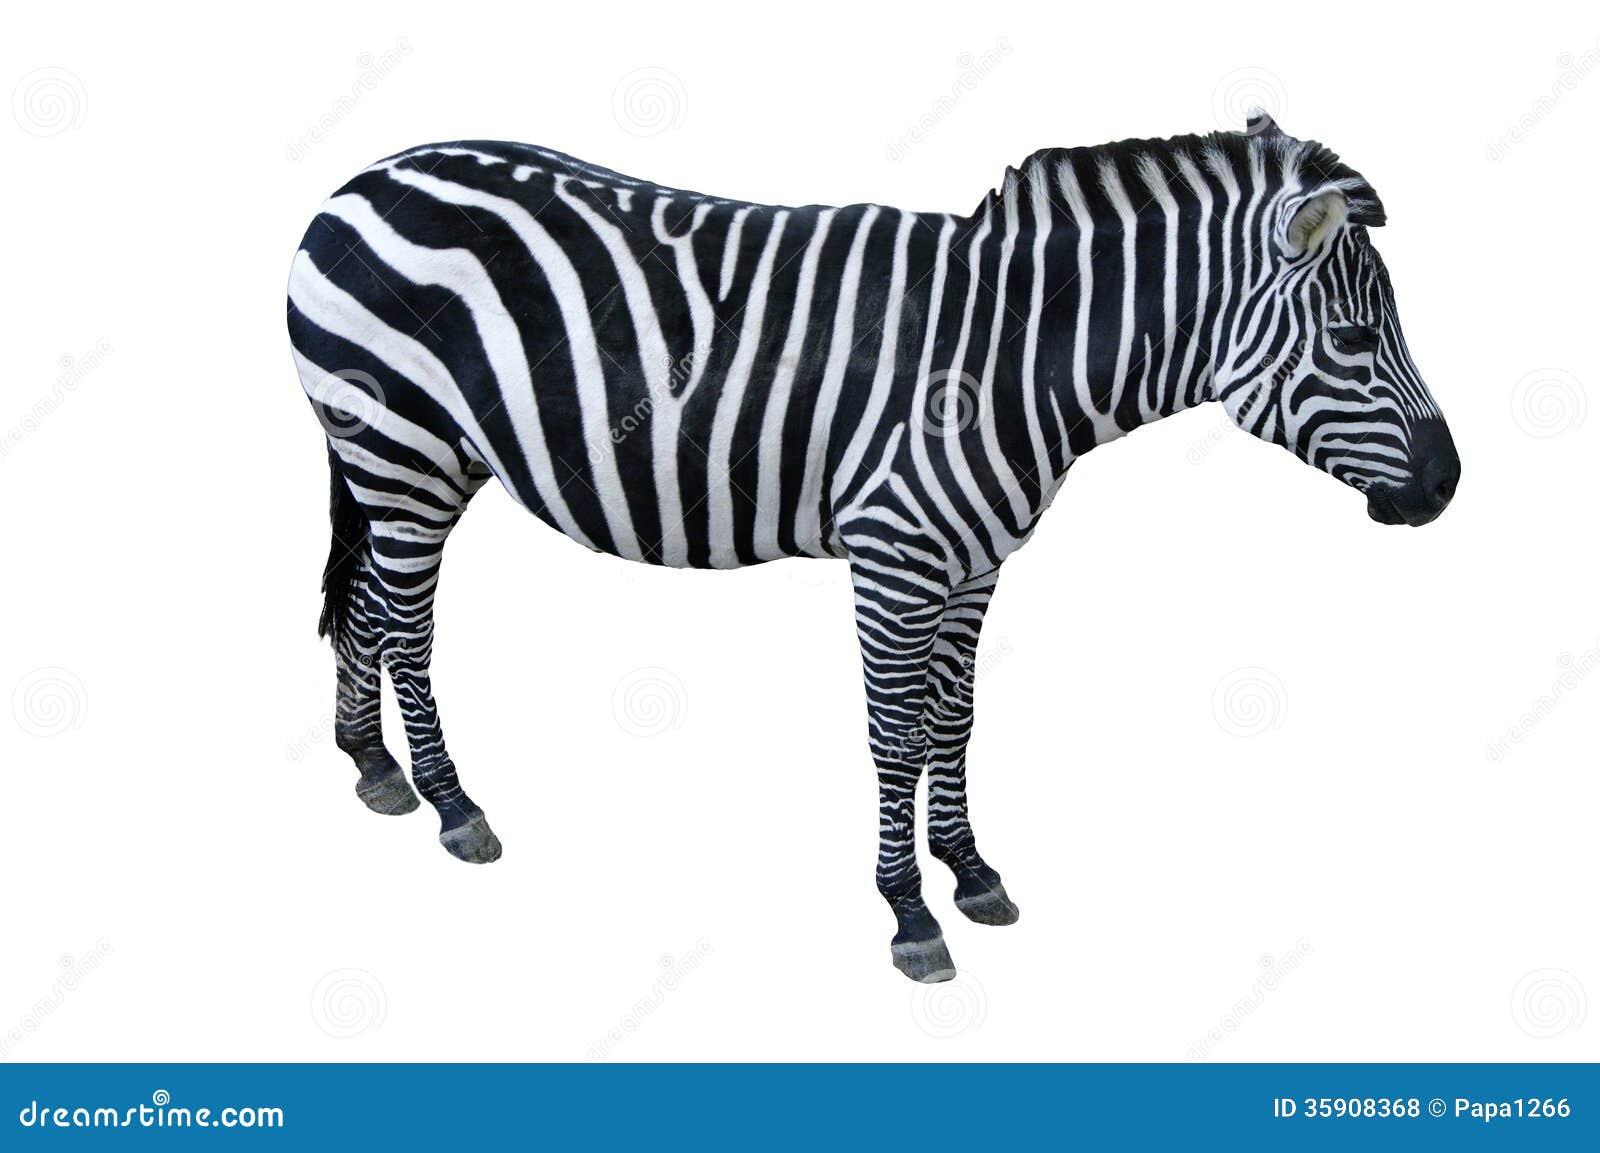 Zebra Royalty Free Stock Photos - Image: 35908368